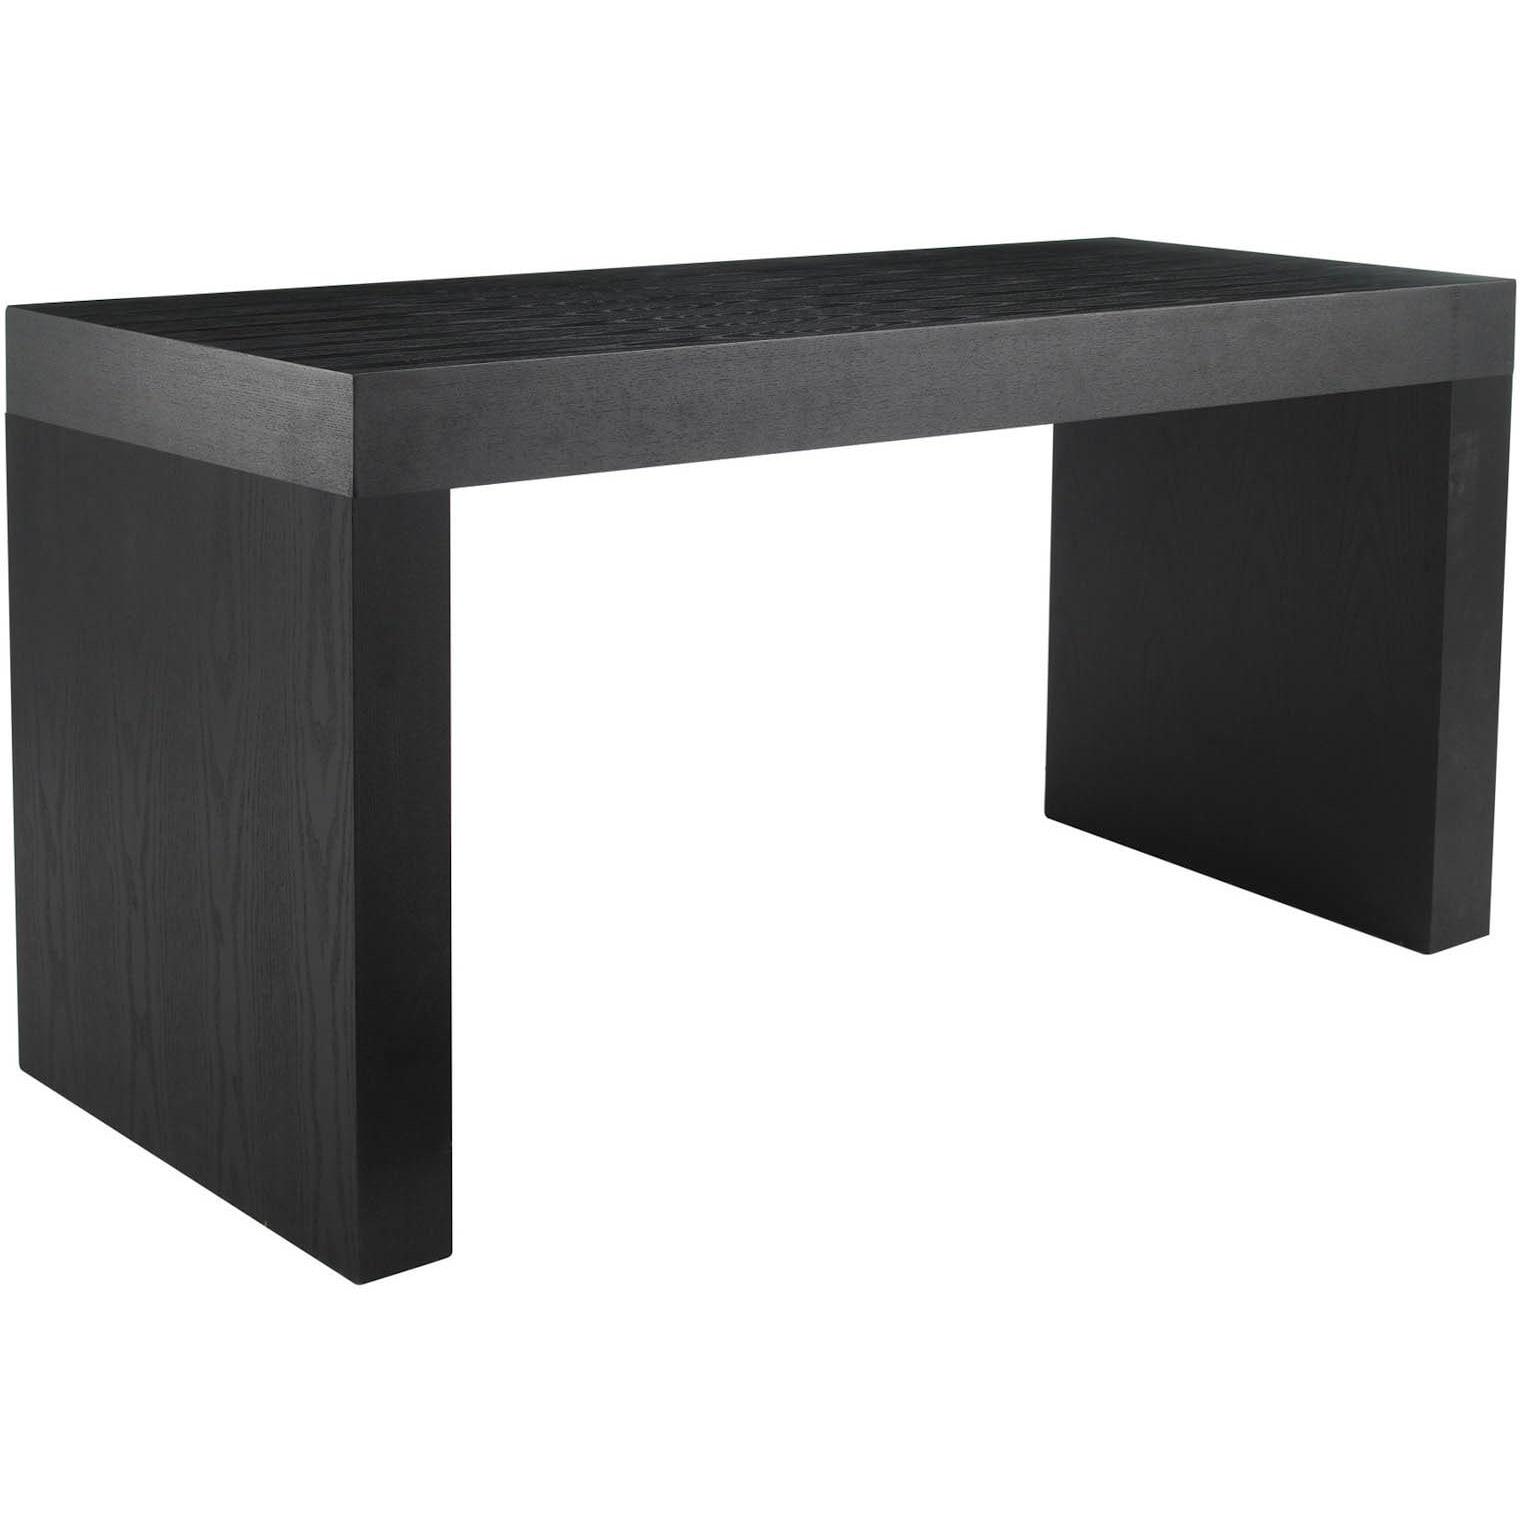 Sunpan Ikon Faro C Shape Counter Table